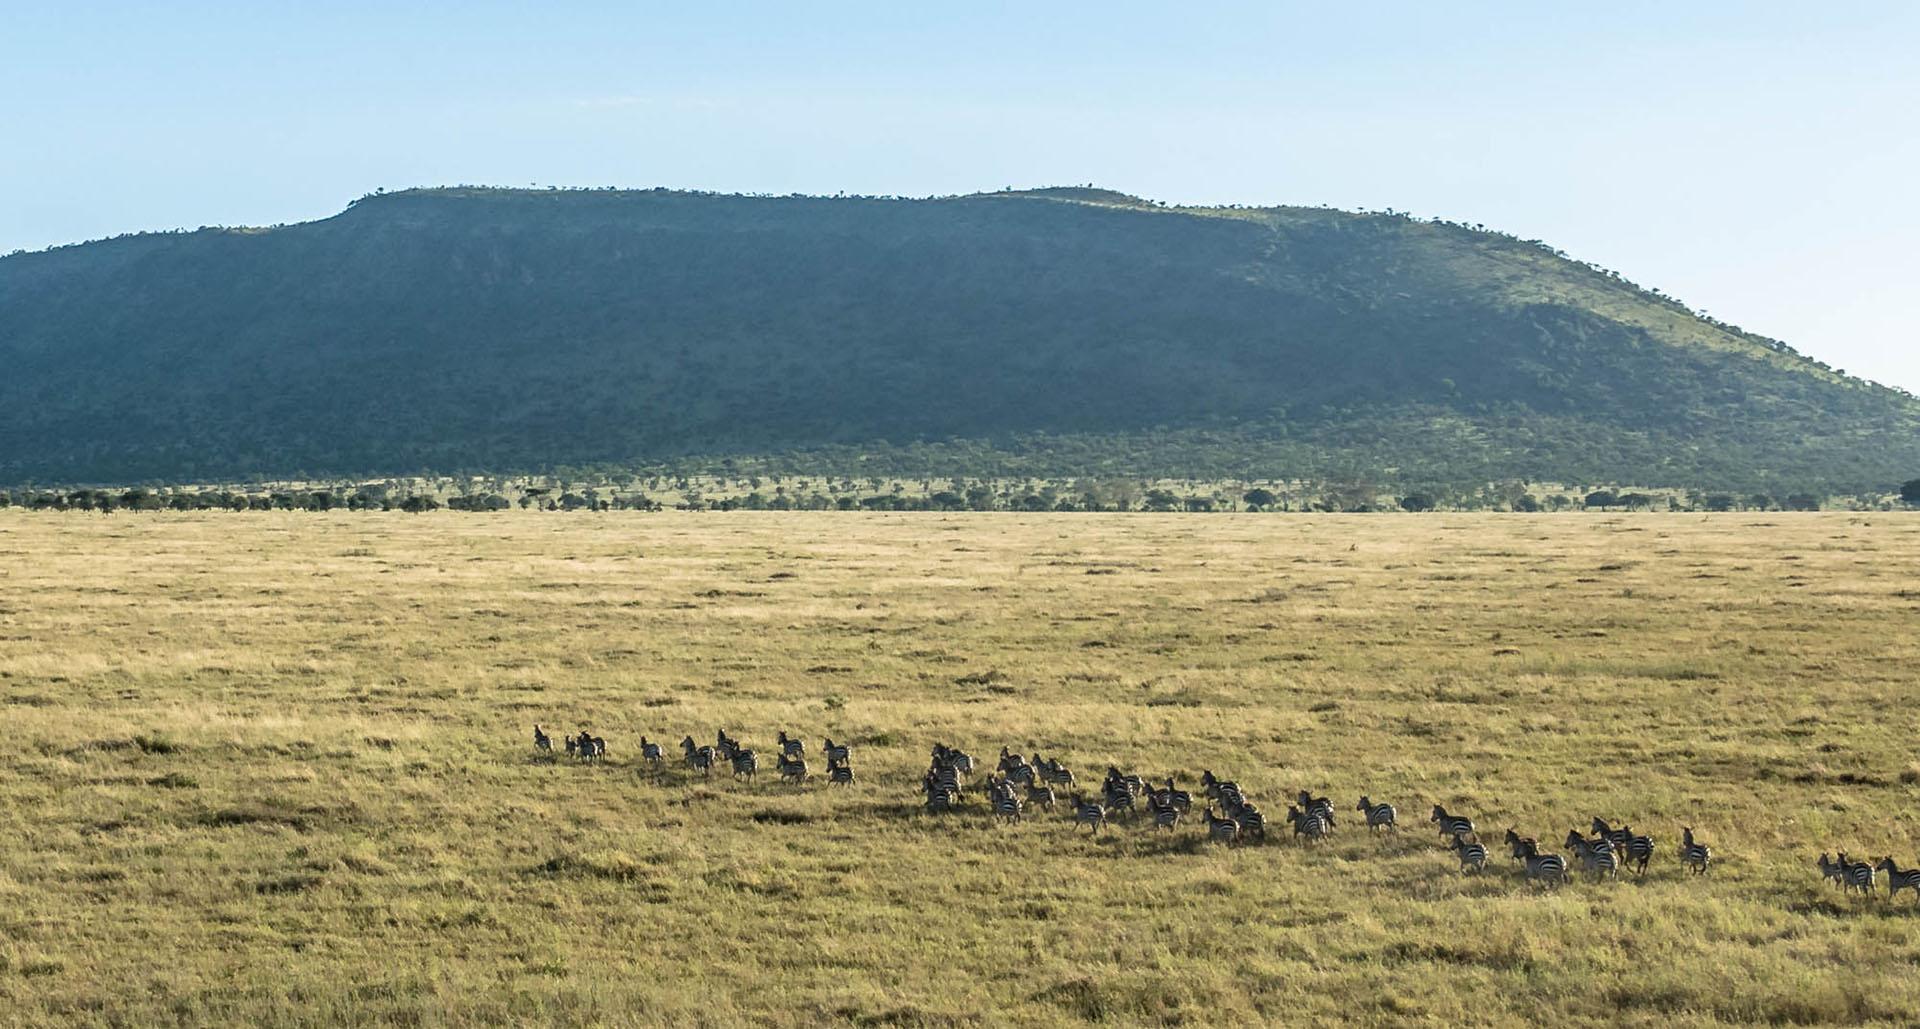 Wildlife safari - 1 day hot air balloon extension, Serengeti National Park, Tanzania